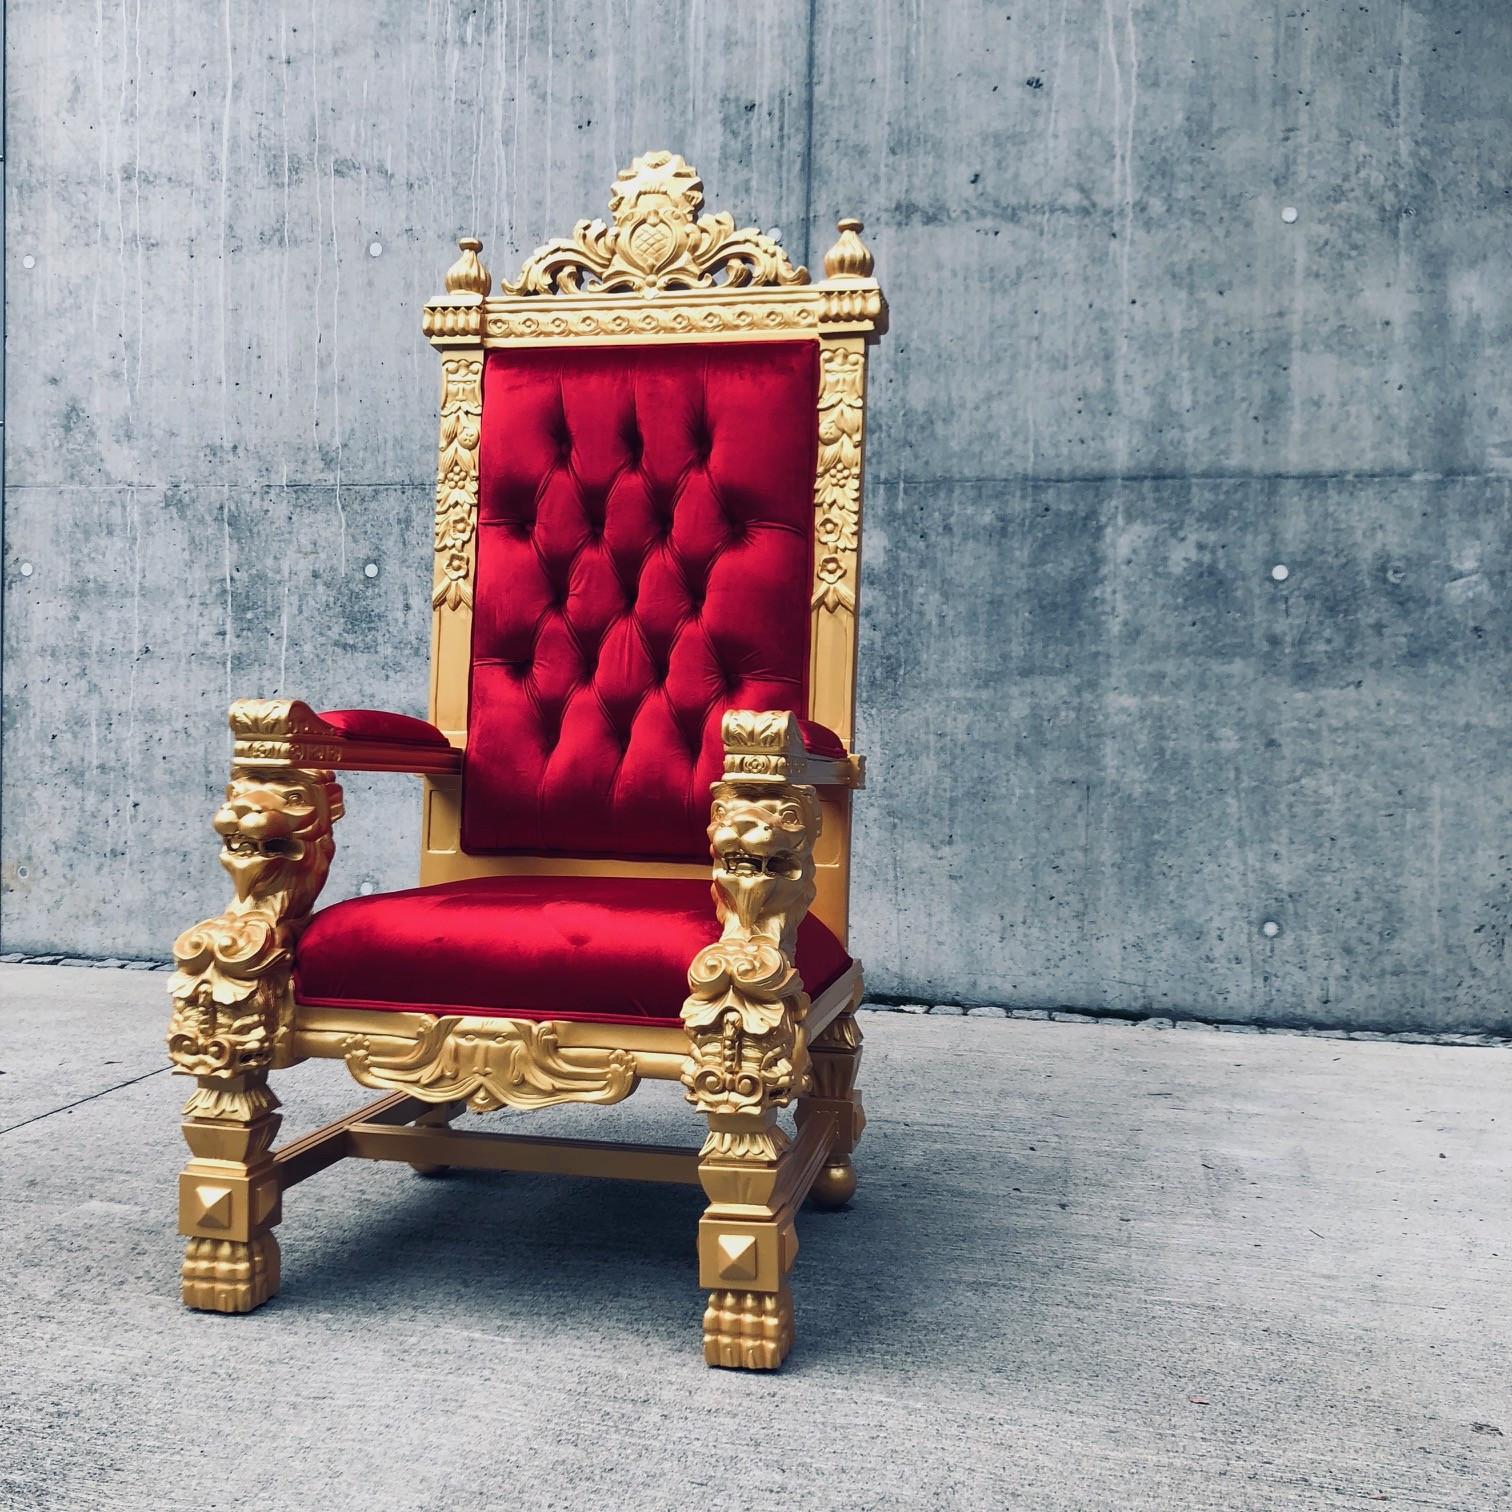 Trone Gul Kongestol Lenestol Oslo Carl Royal